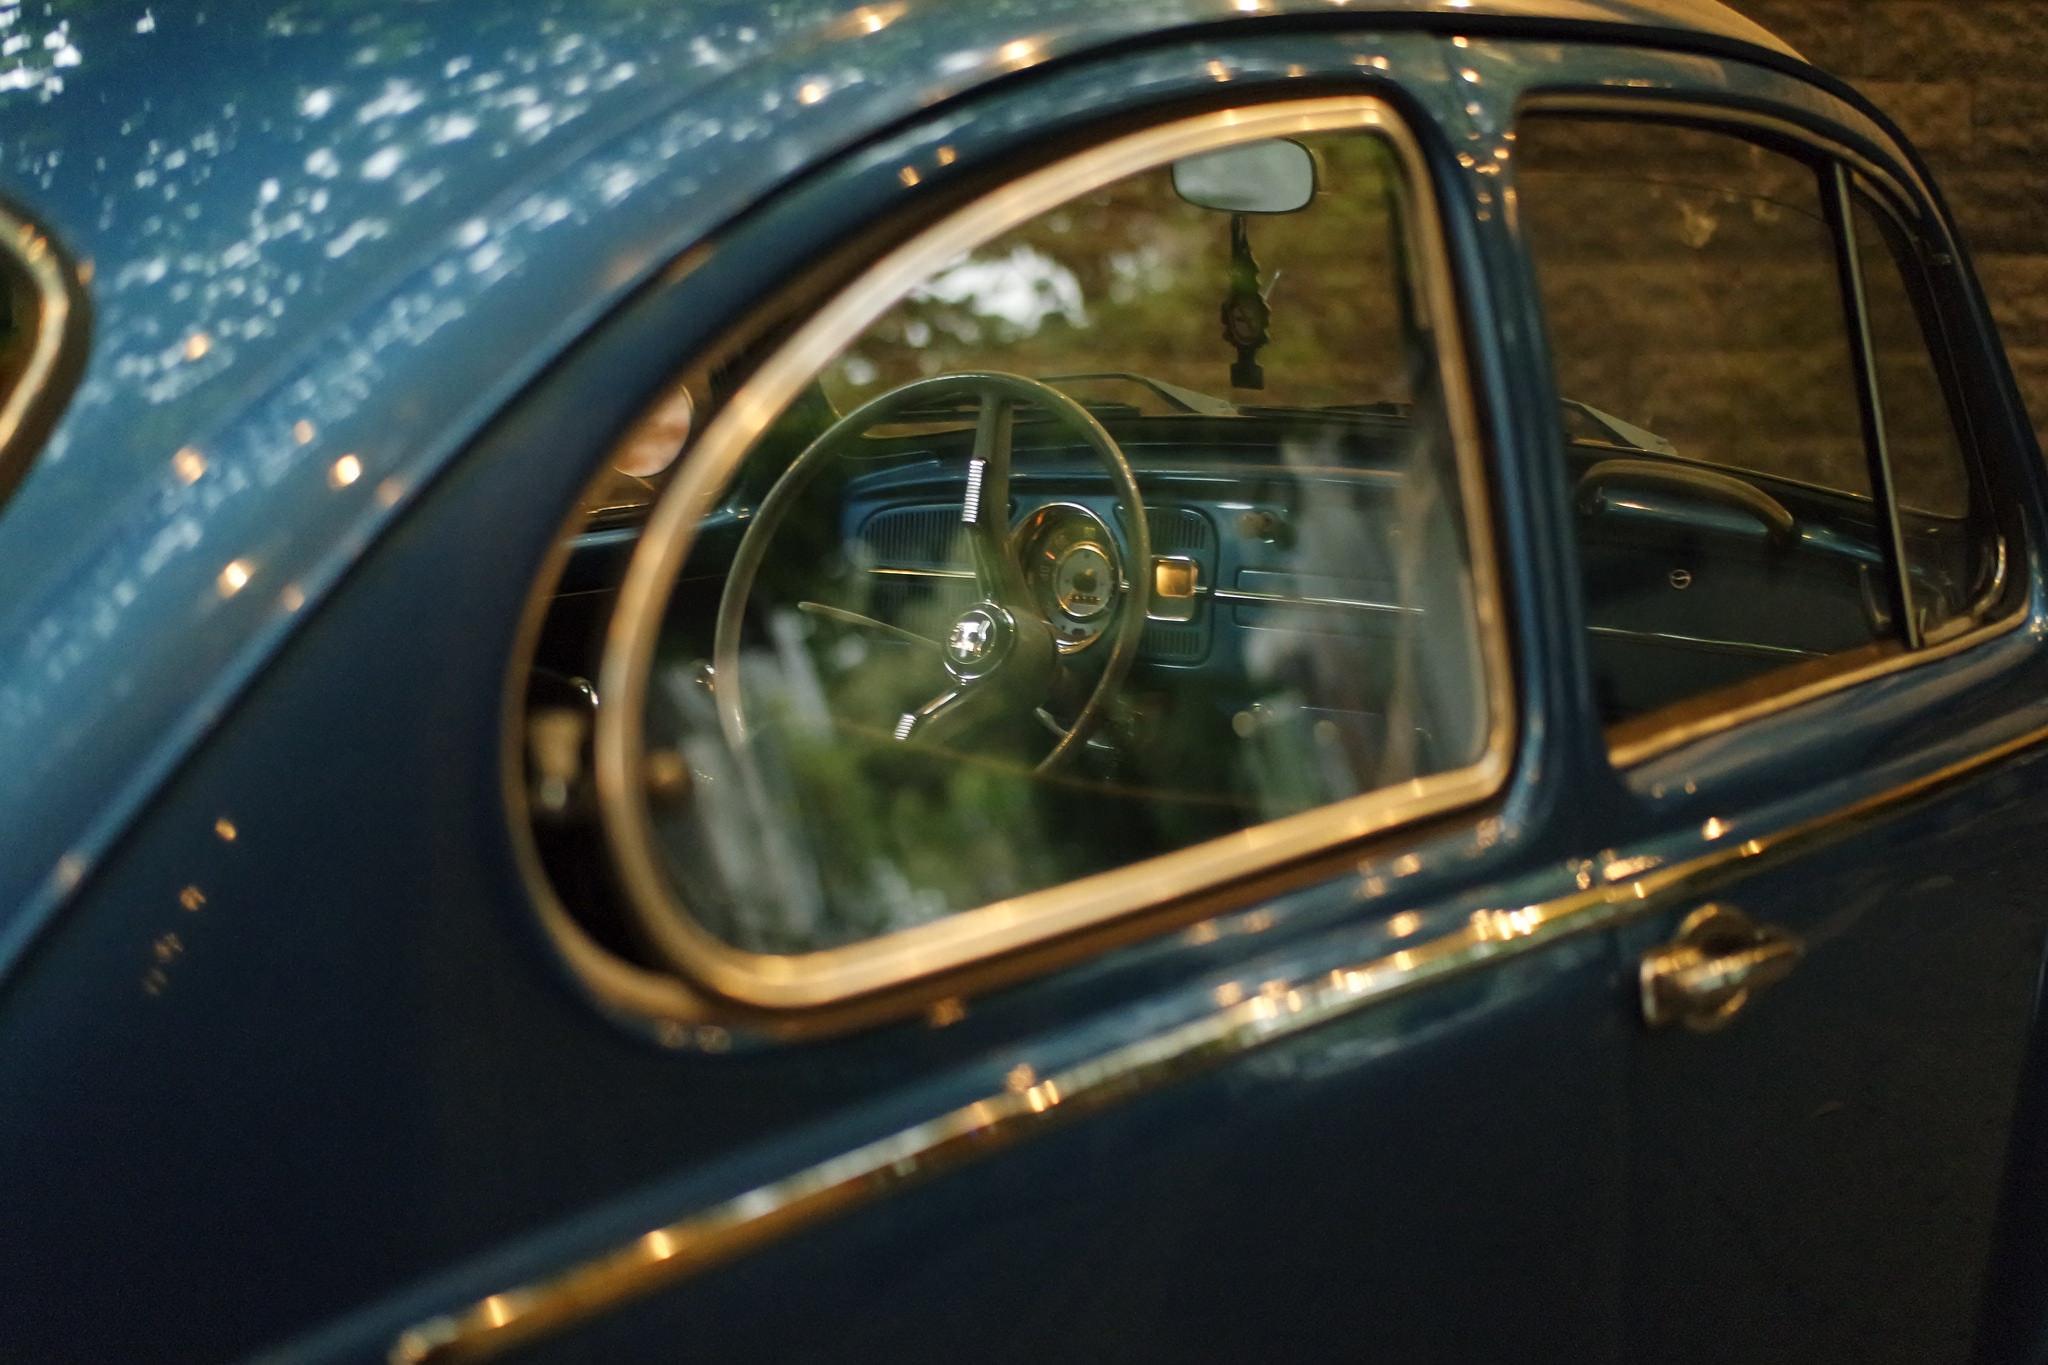 Blue Volkswagen Beetle, Blue, Car, Classic car, Dashboard, HQ Photo